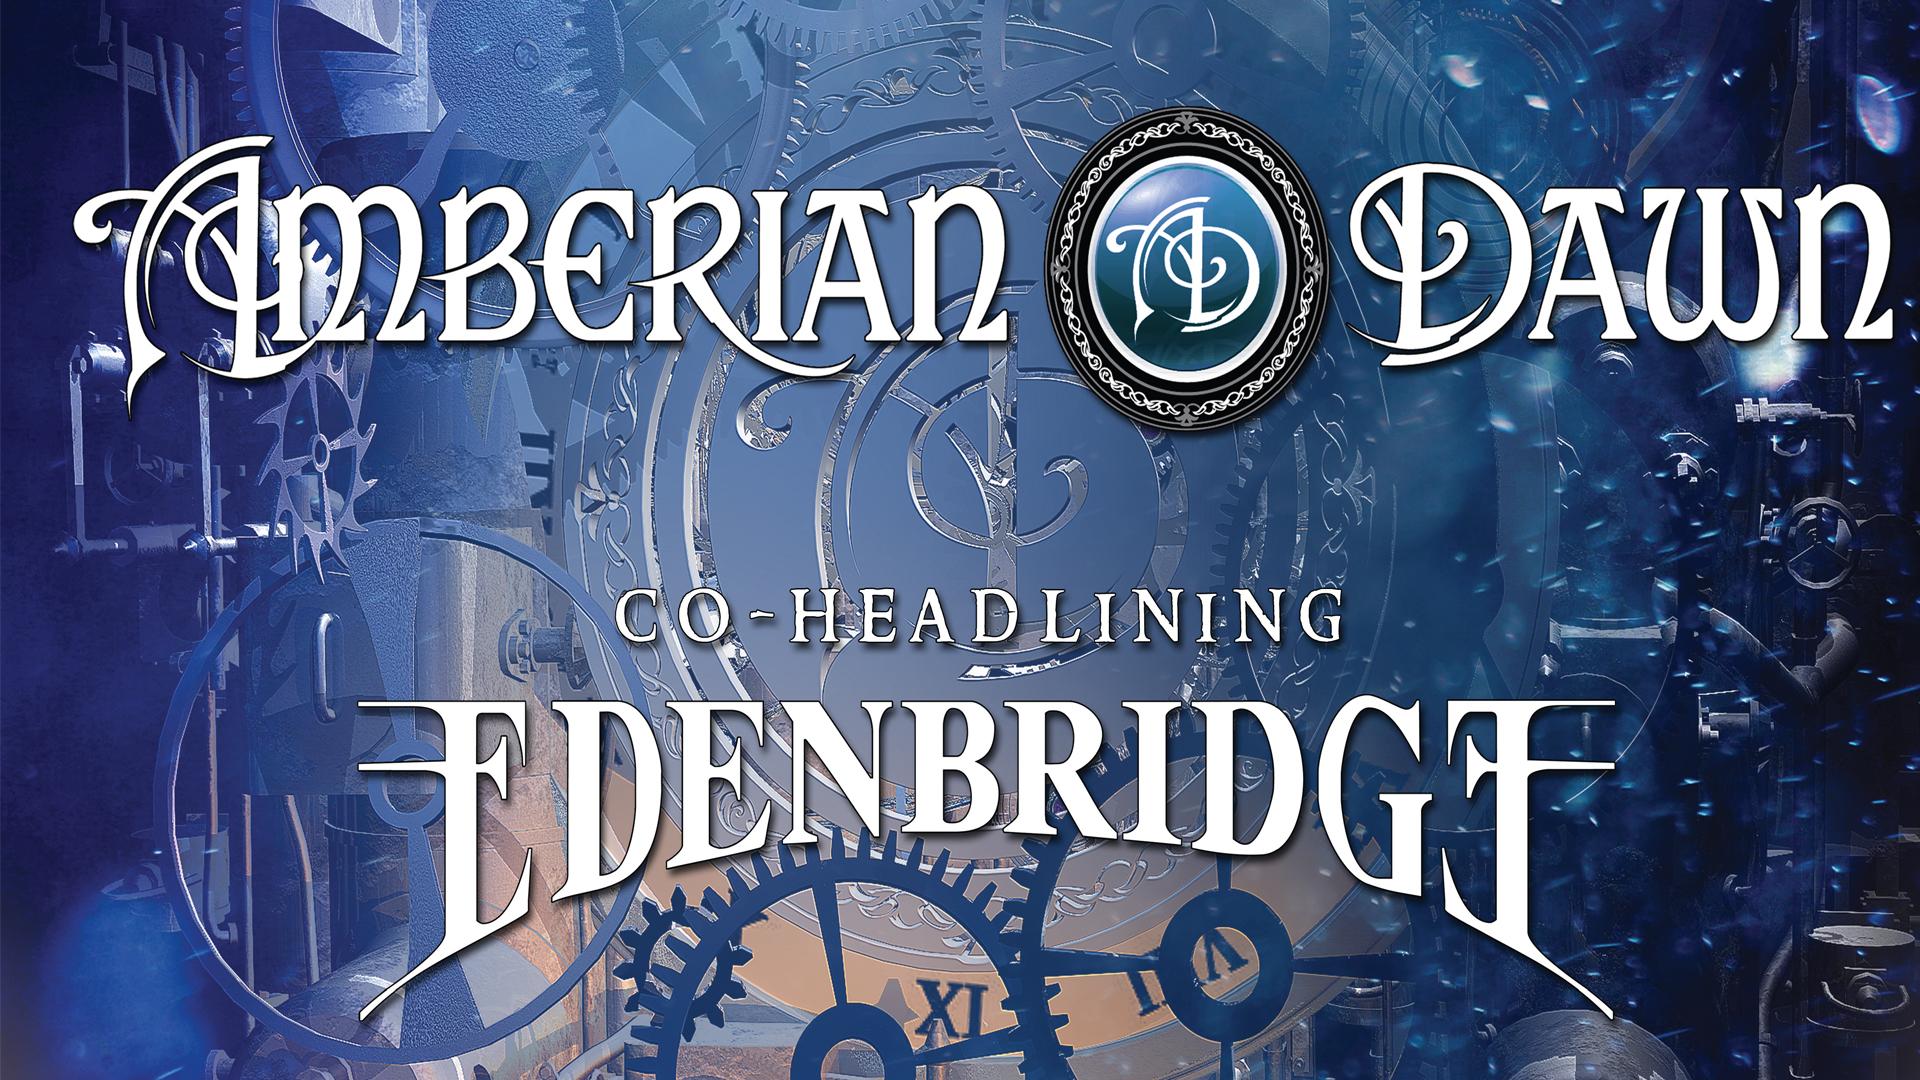 Preview: Amberian Dawn + Edenbridge + Manzana